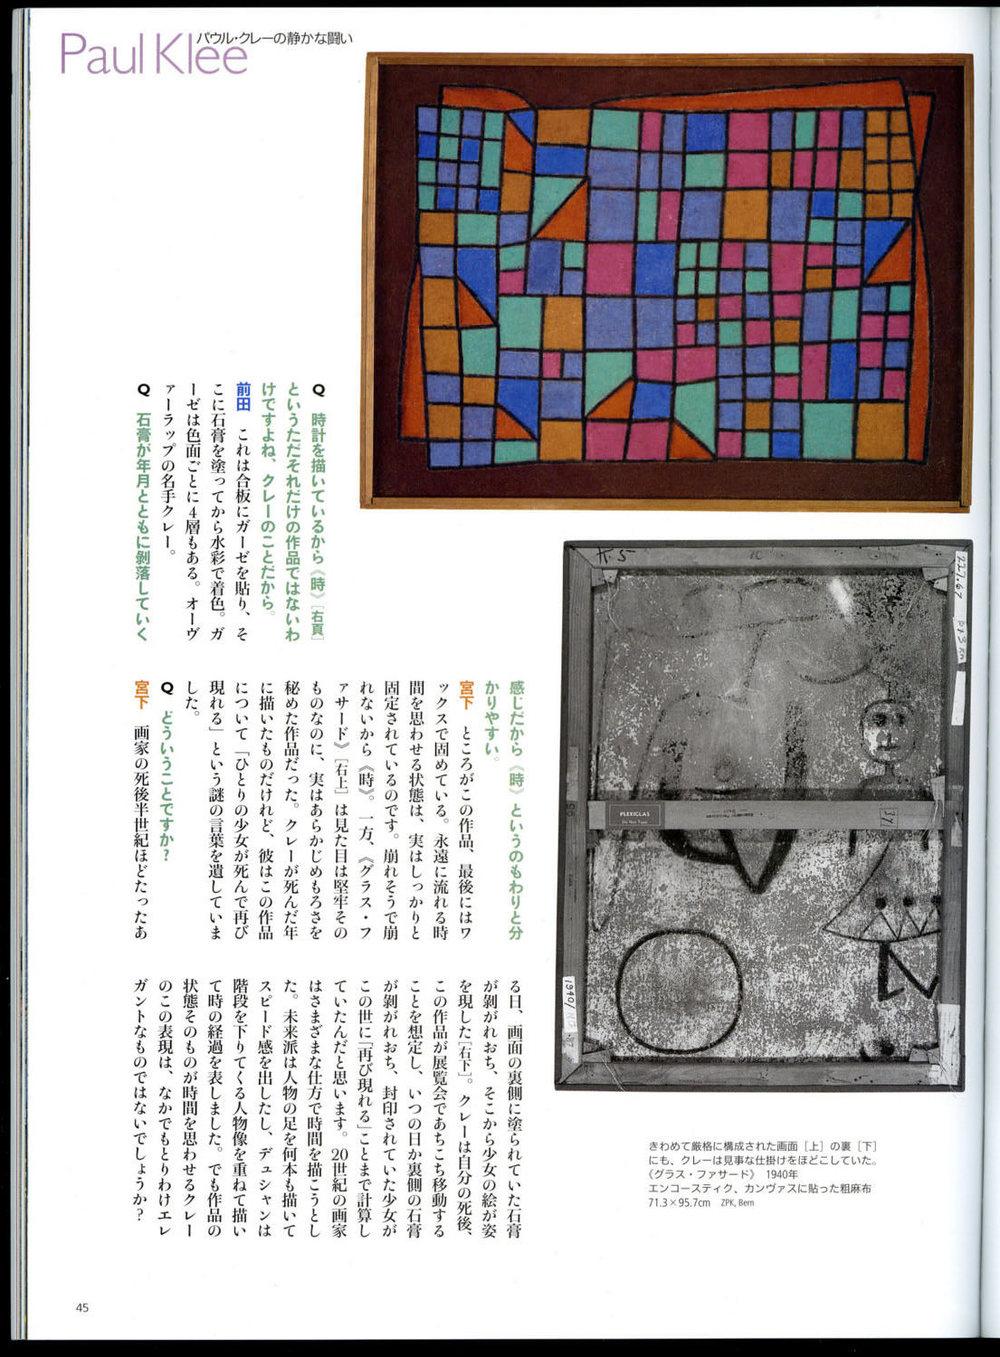 Abb. 8:Geijutsu Shincho, Bd. 56, Dezember 2005, S. 45 © Zentrum Paul Klee, Bern, Bildarchiv